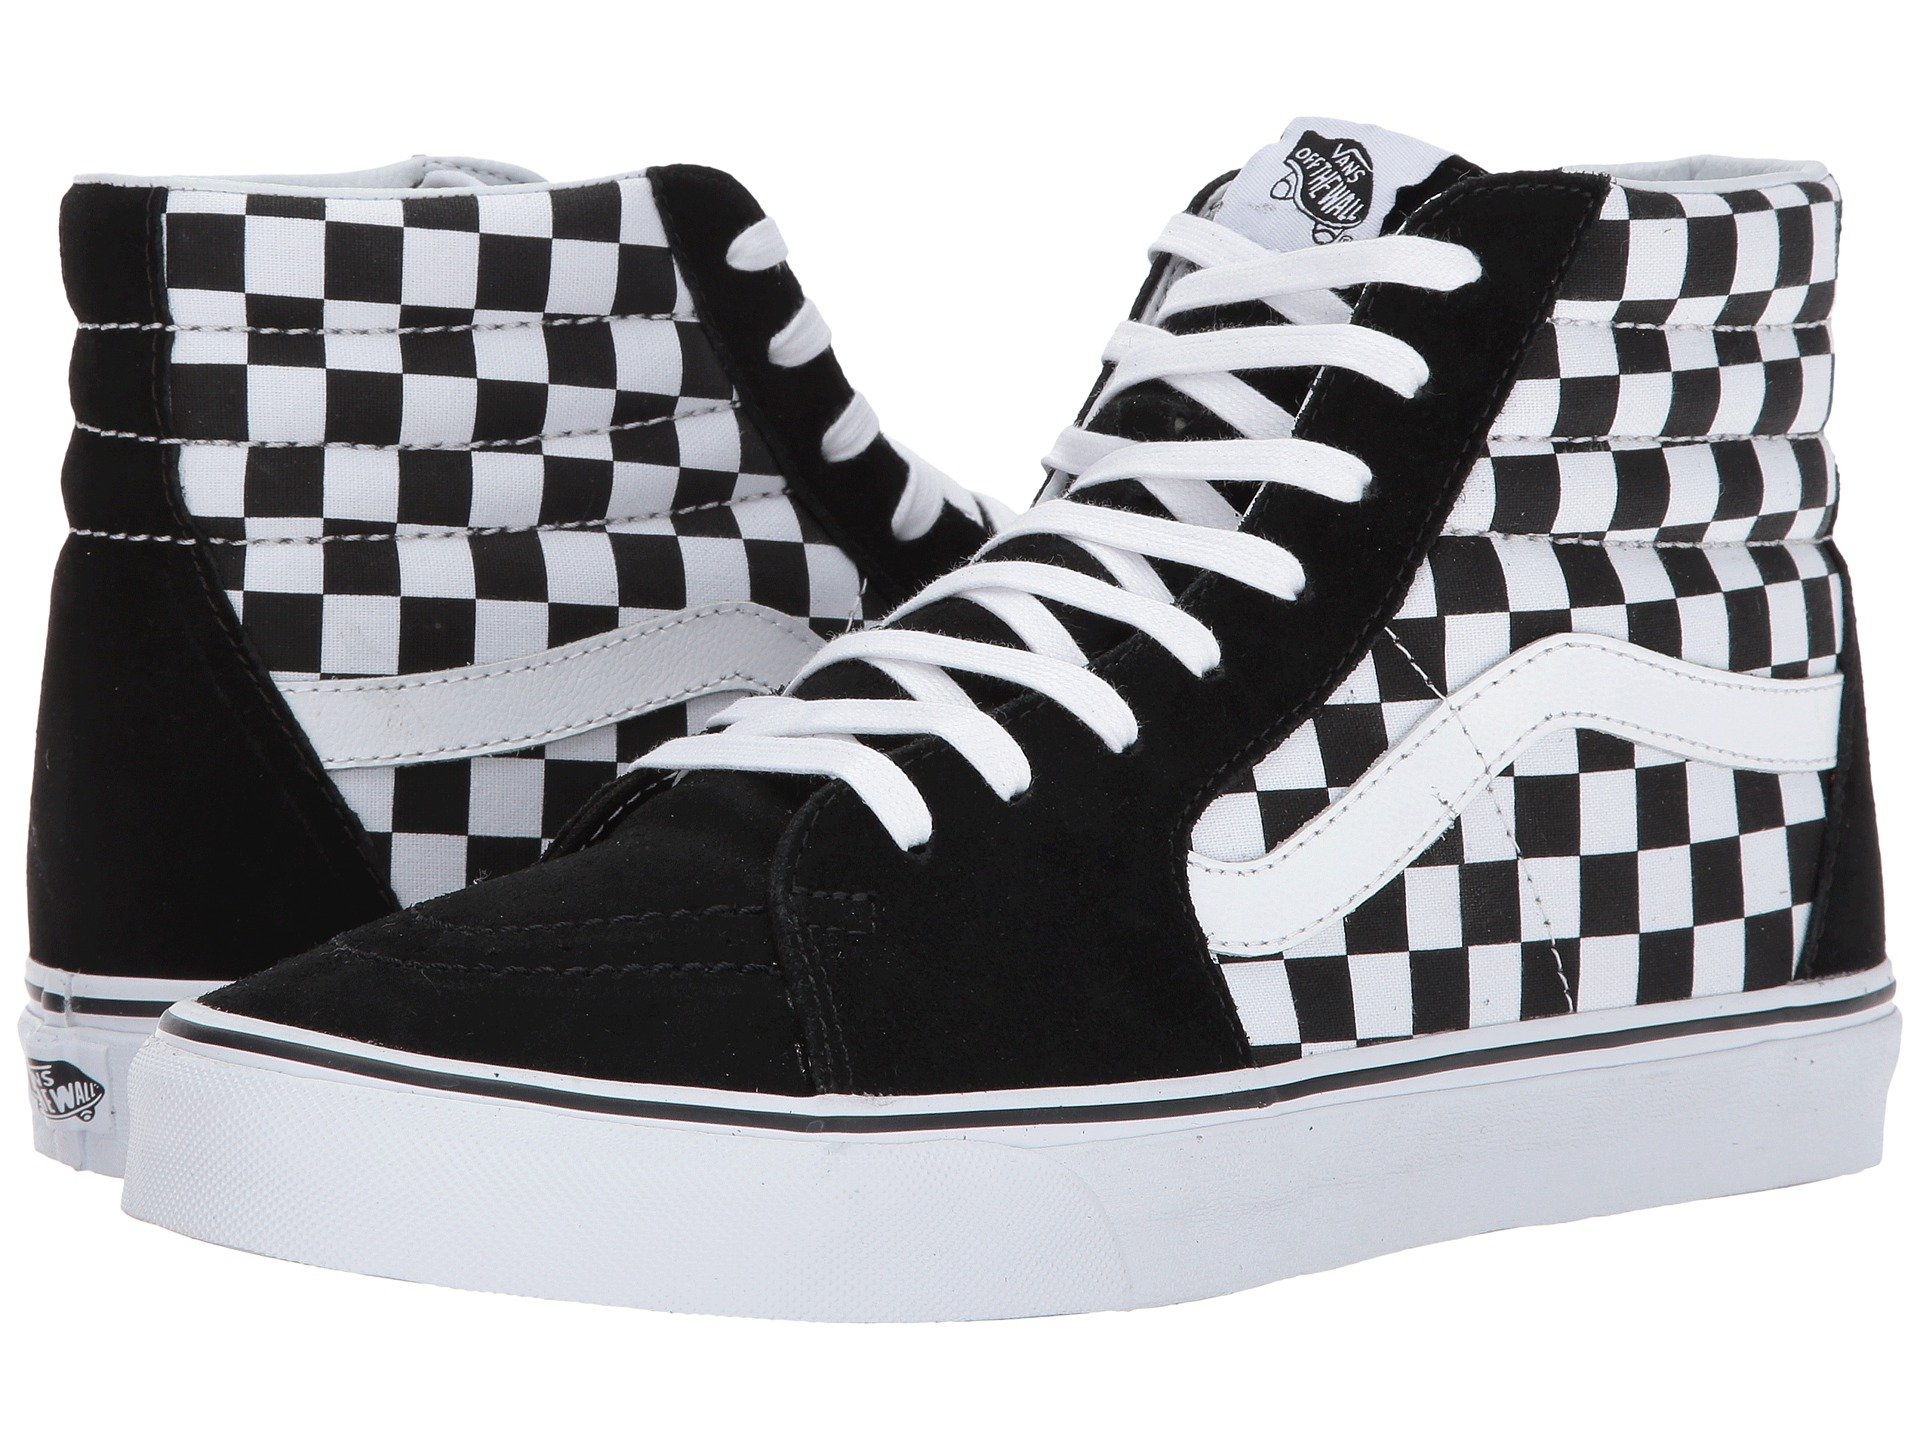 5b8916e4a9 black vans zappos